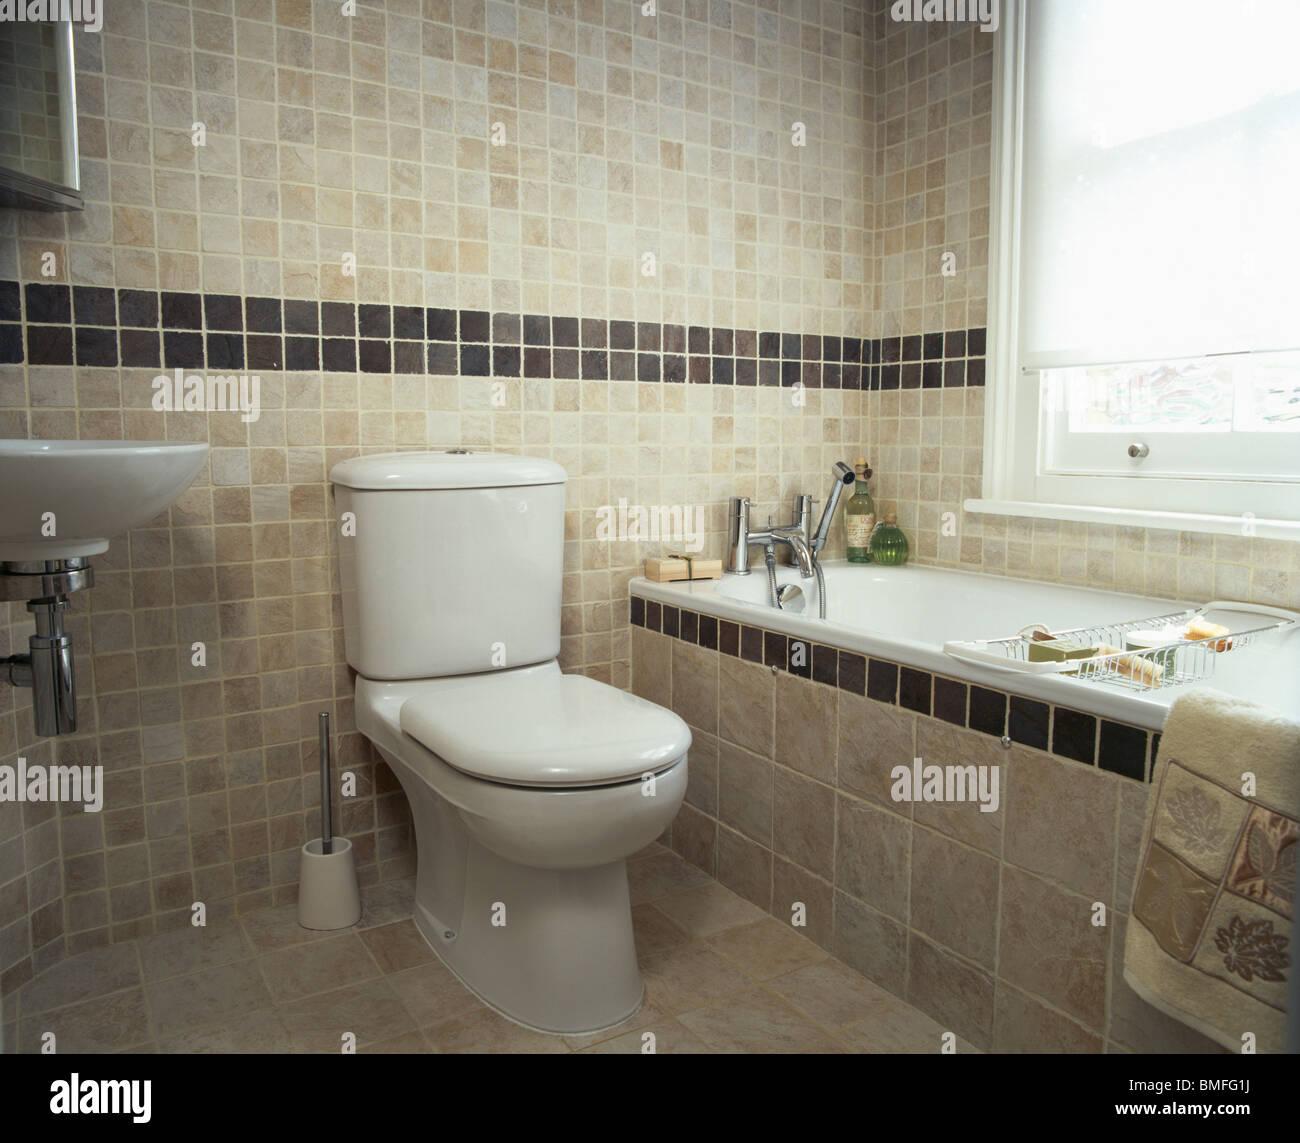 Toilet beside bath with tiled surround in modern beige